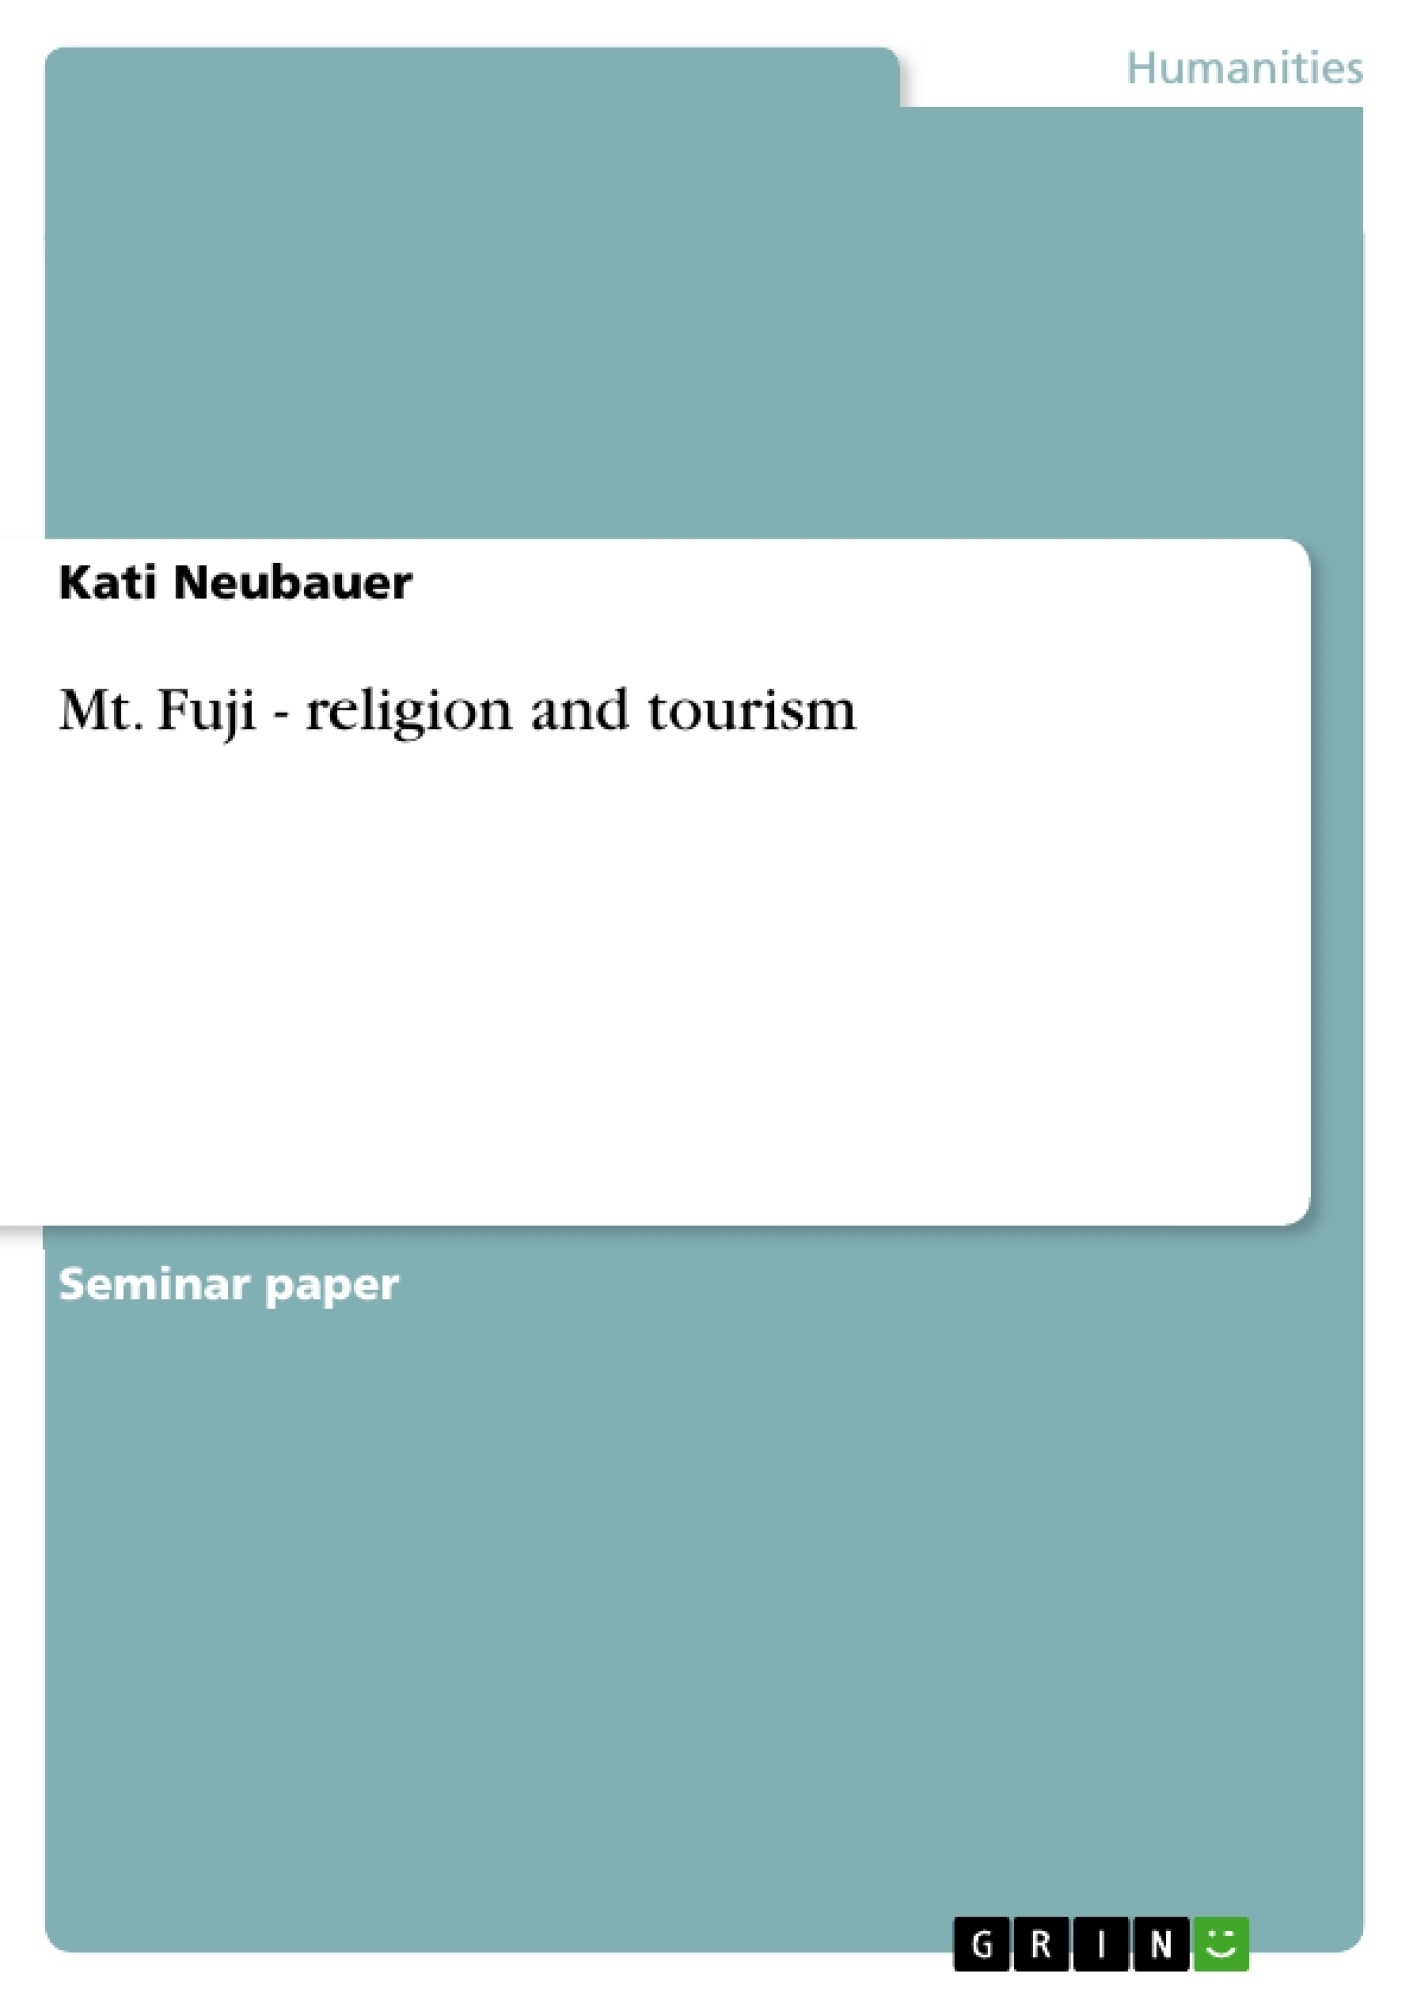 Title: Mt. Fuji - religion and tourism